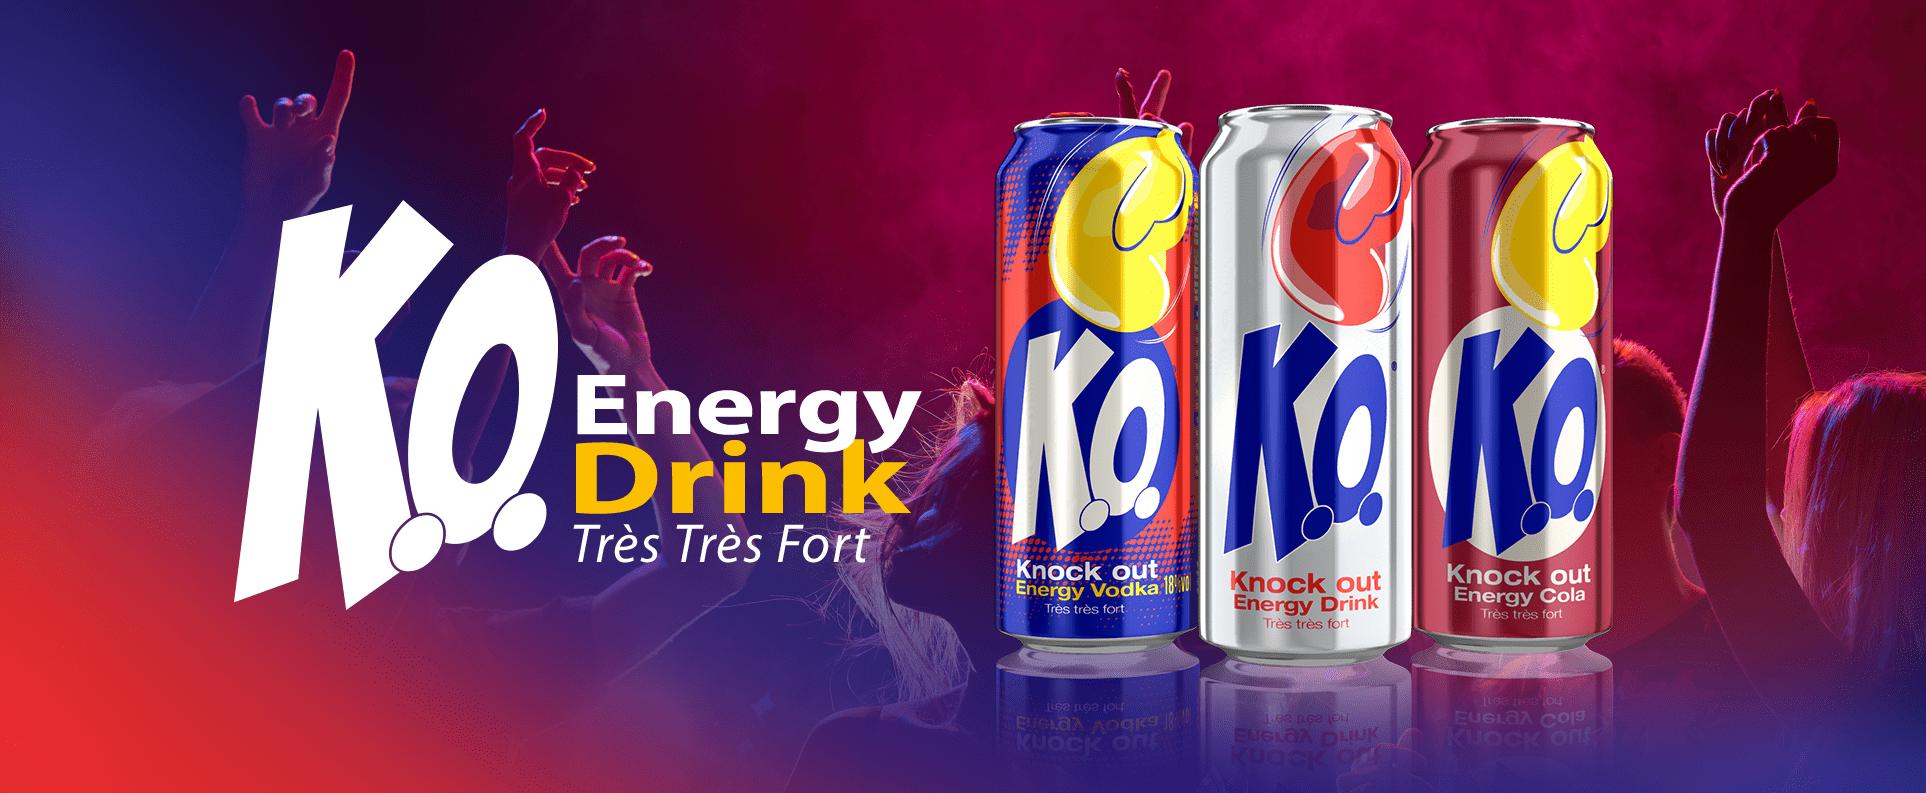 K.O Energy Drink